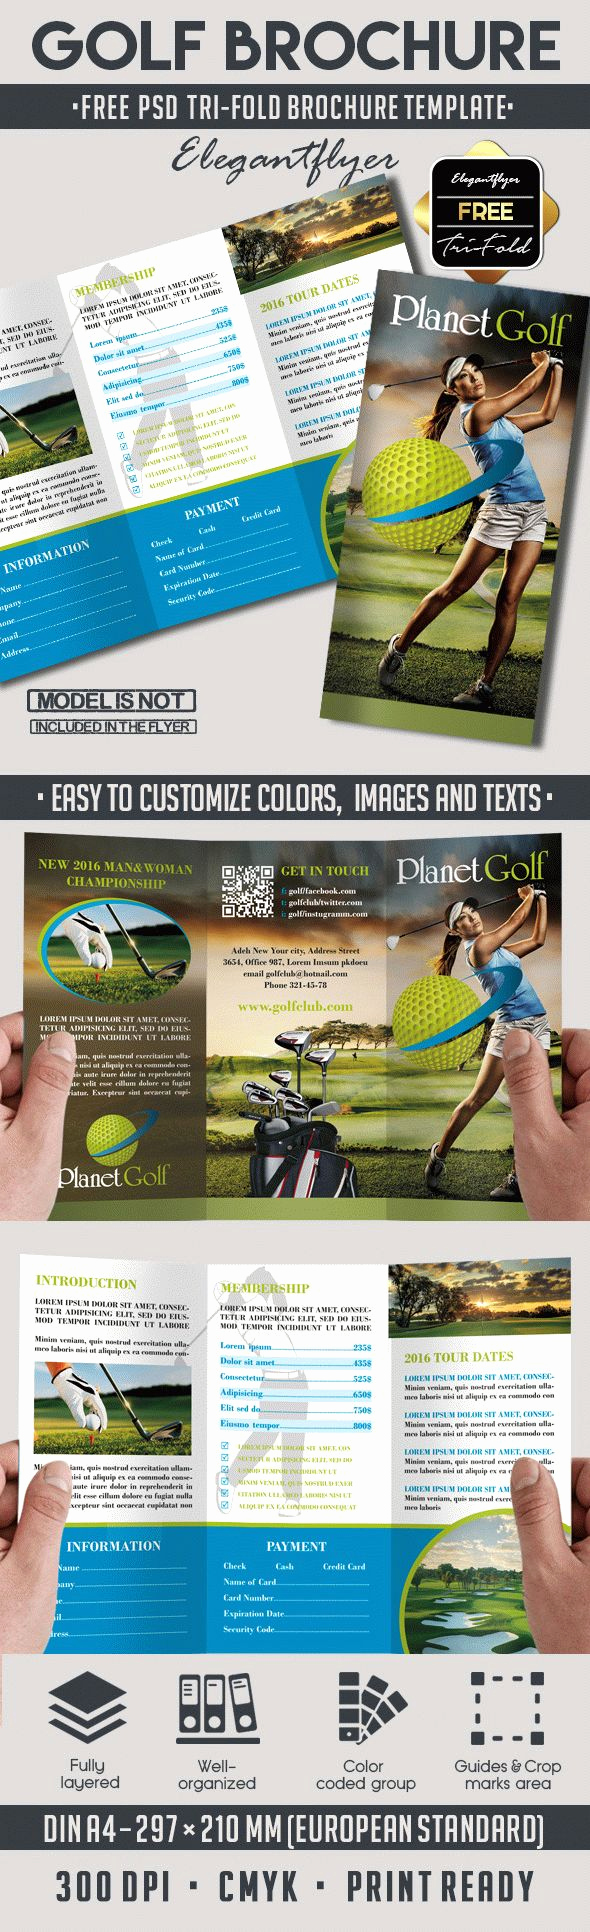 Tri Fold Brochure Template Psd Lovely Golf Club – Free Psd Tri Fold Psd Brochure Template – by